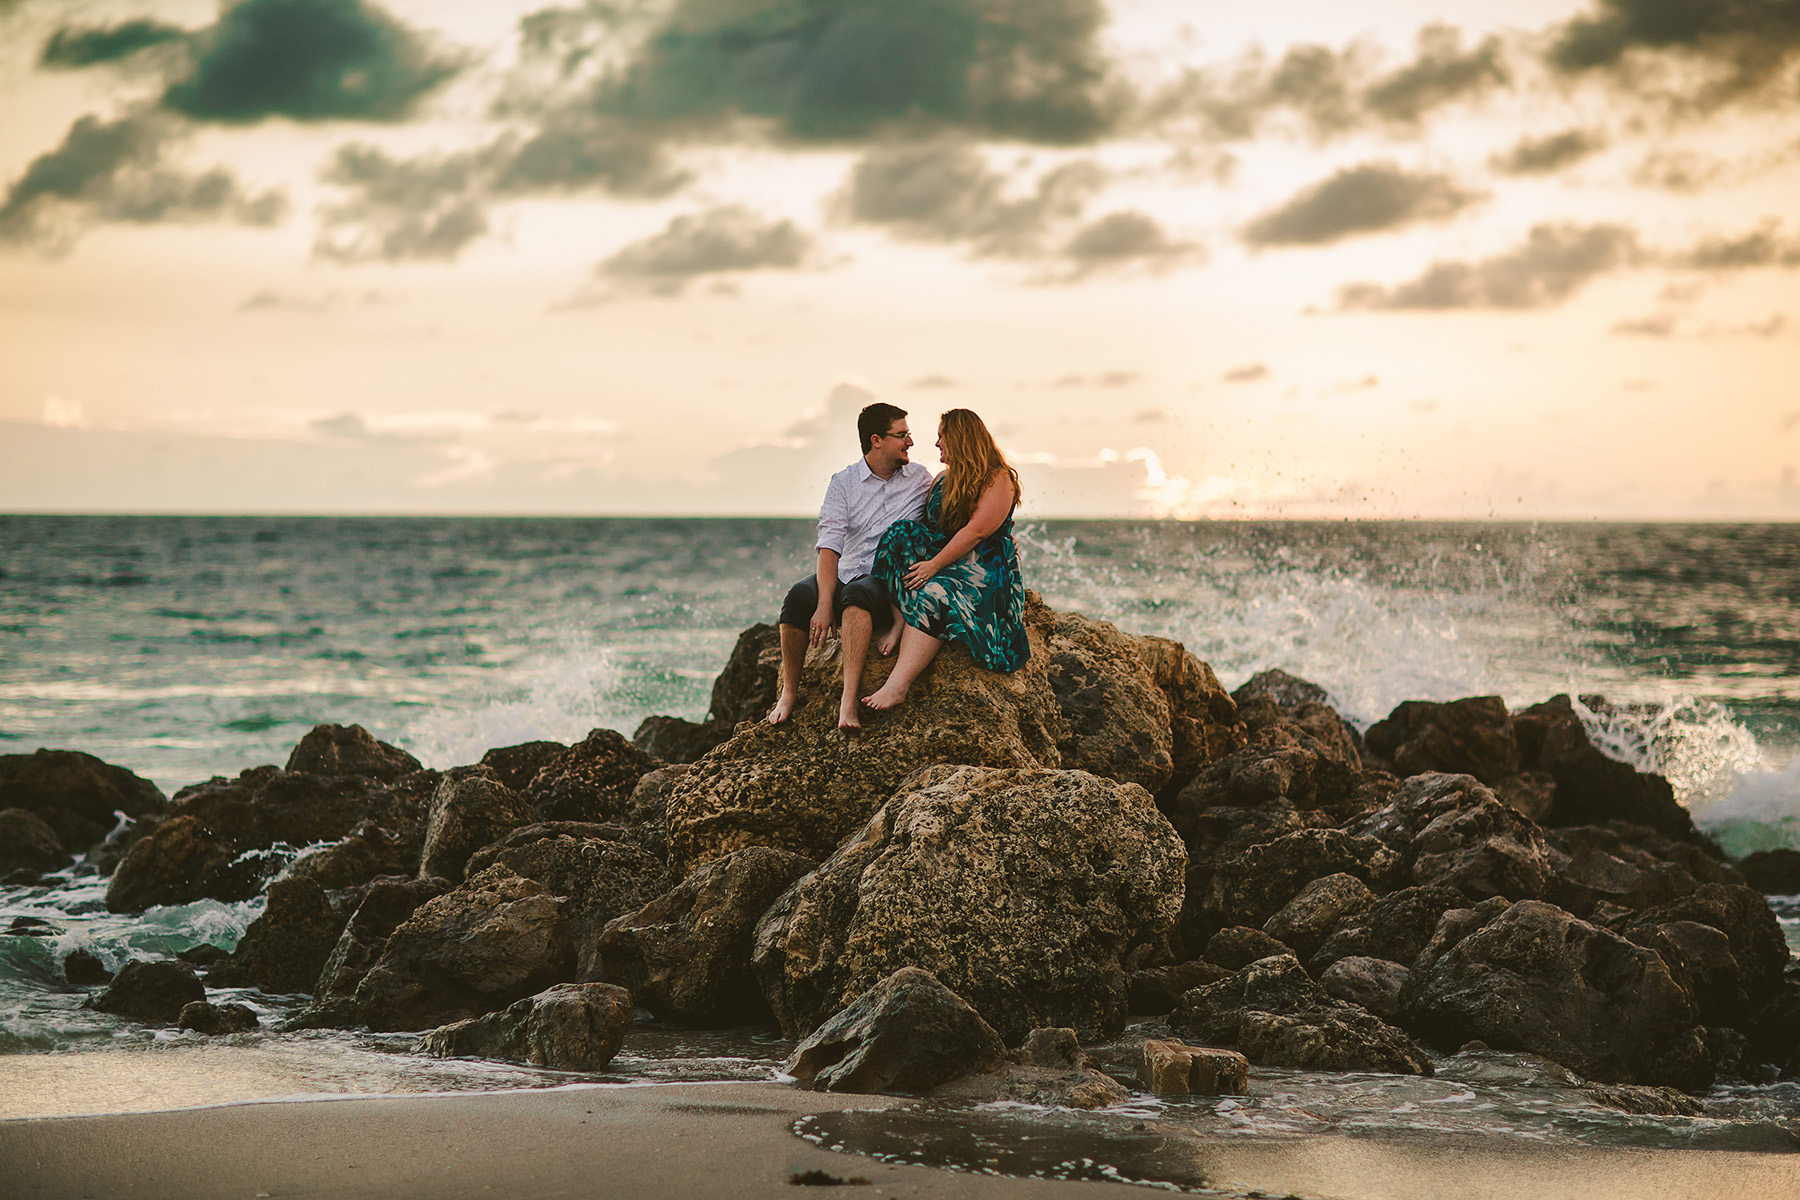 rocks-engagement-beachy-portrait-session-tiny-house-photo.jpg